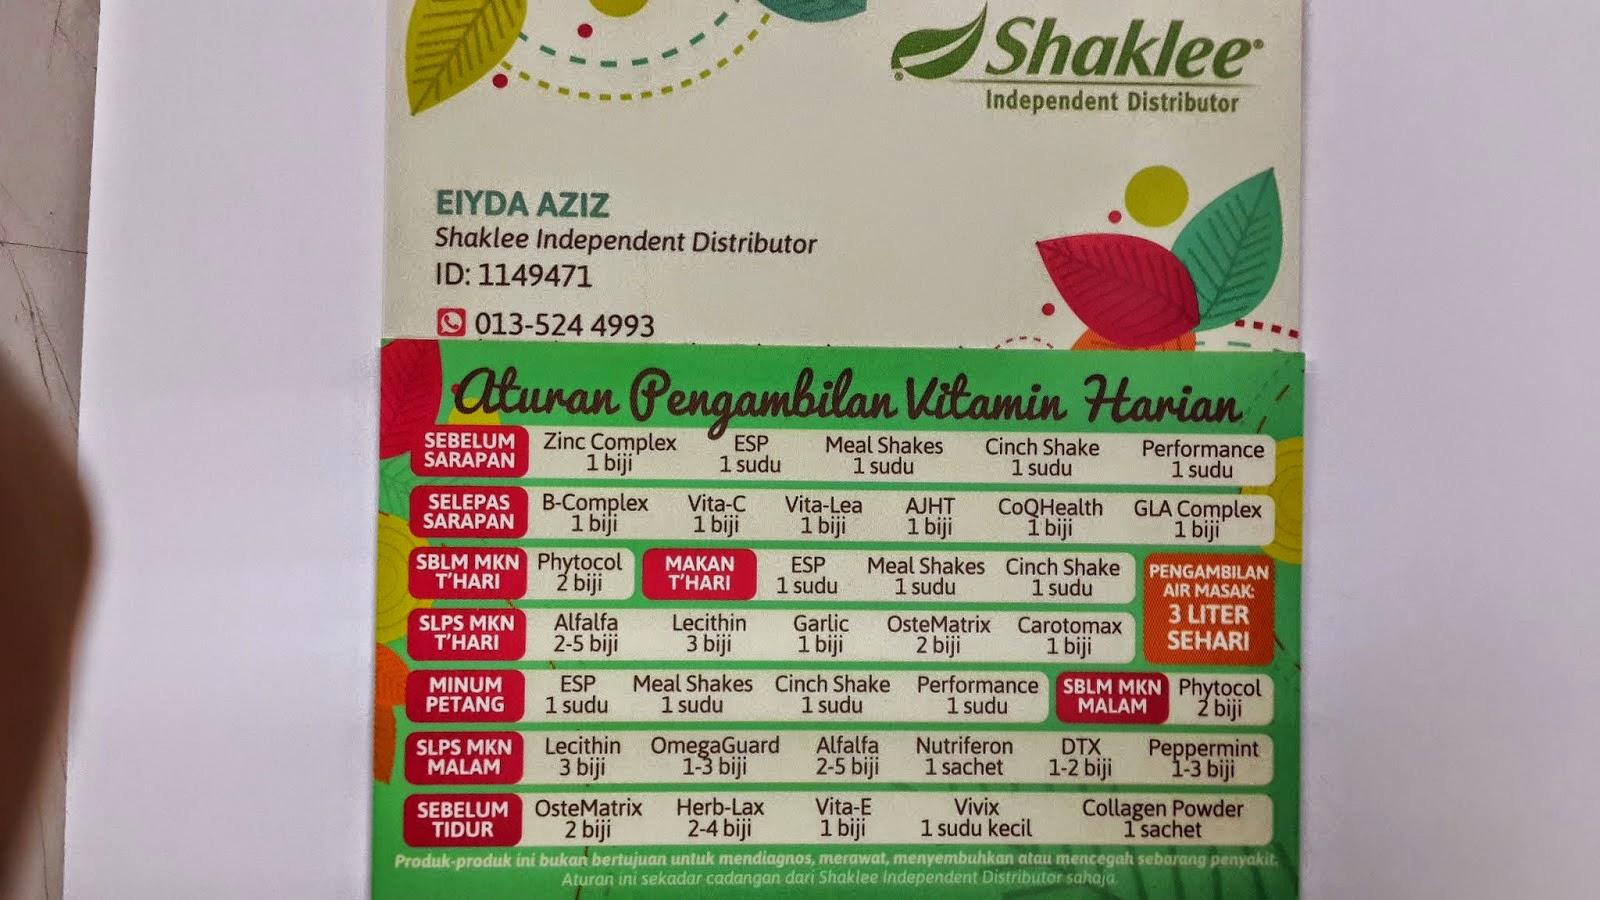 Jadual Pemakanan Vitamin Shaklee